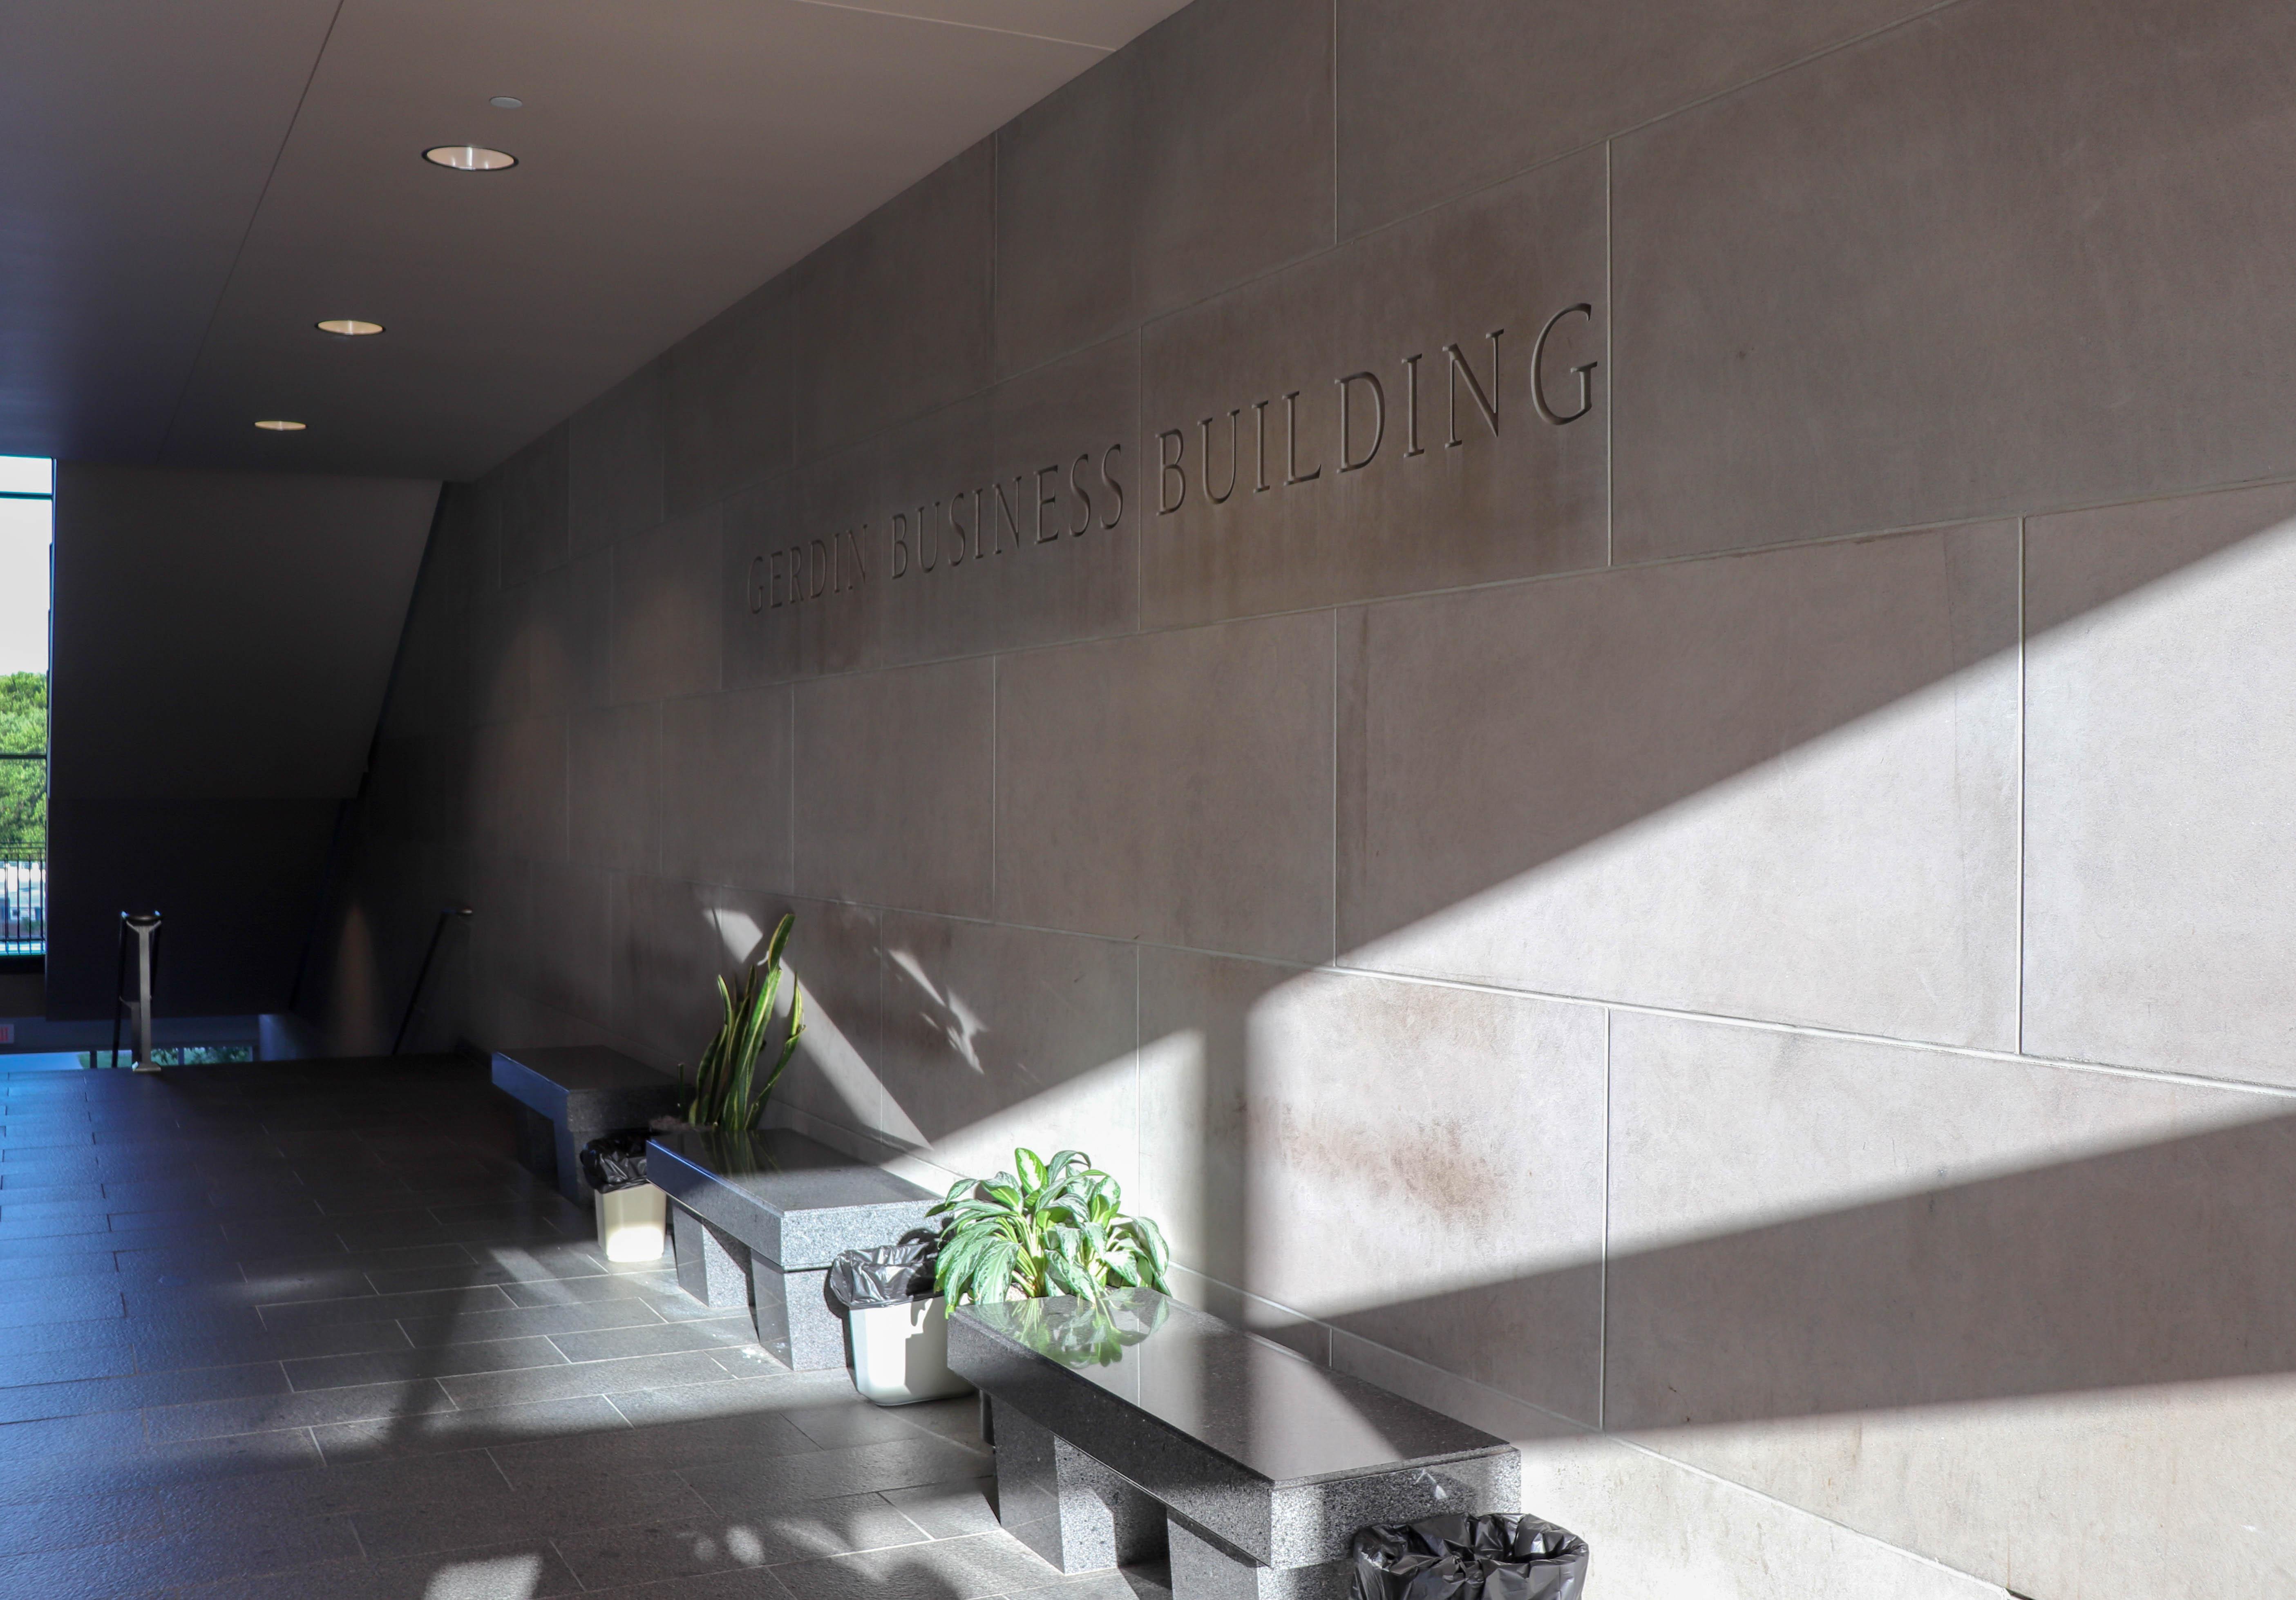 iowa state gerdin business building